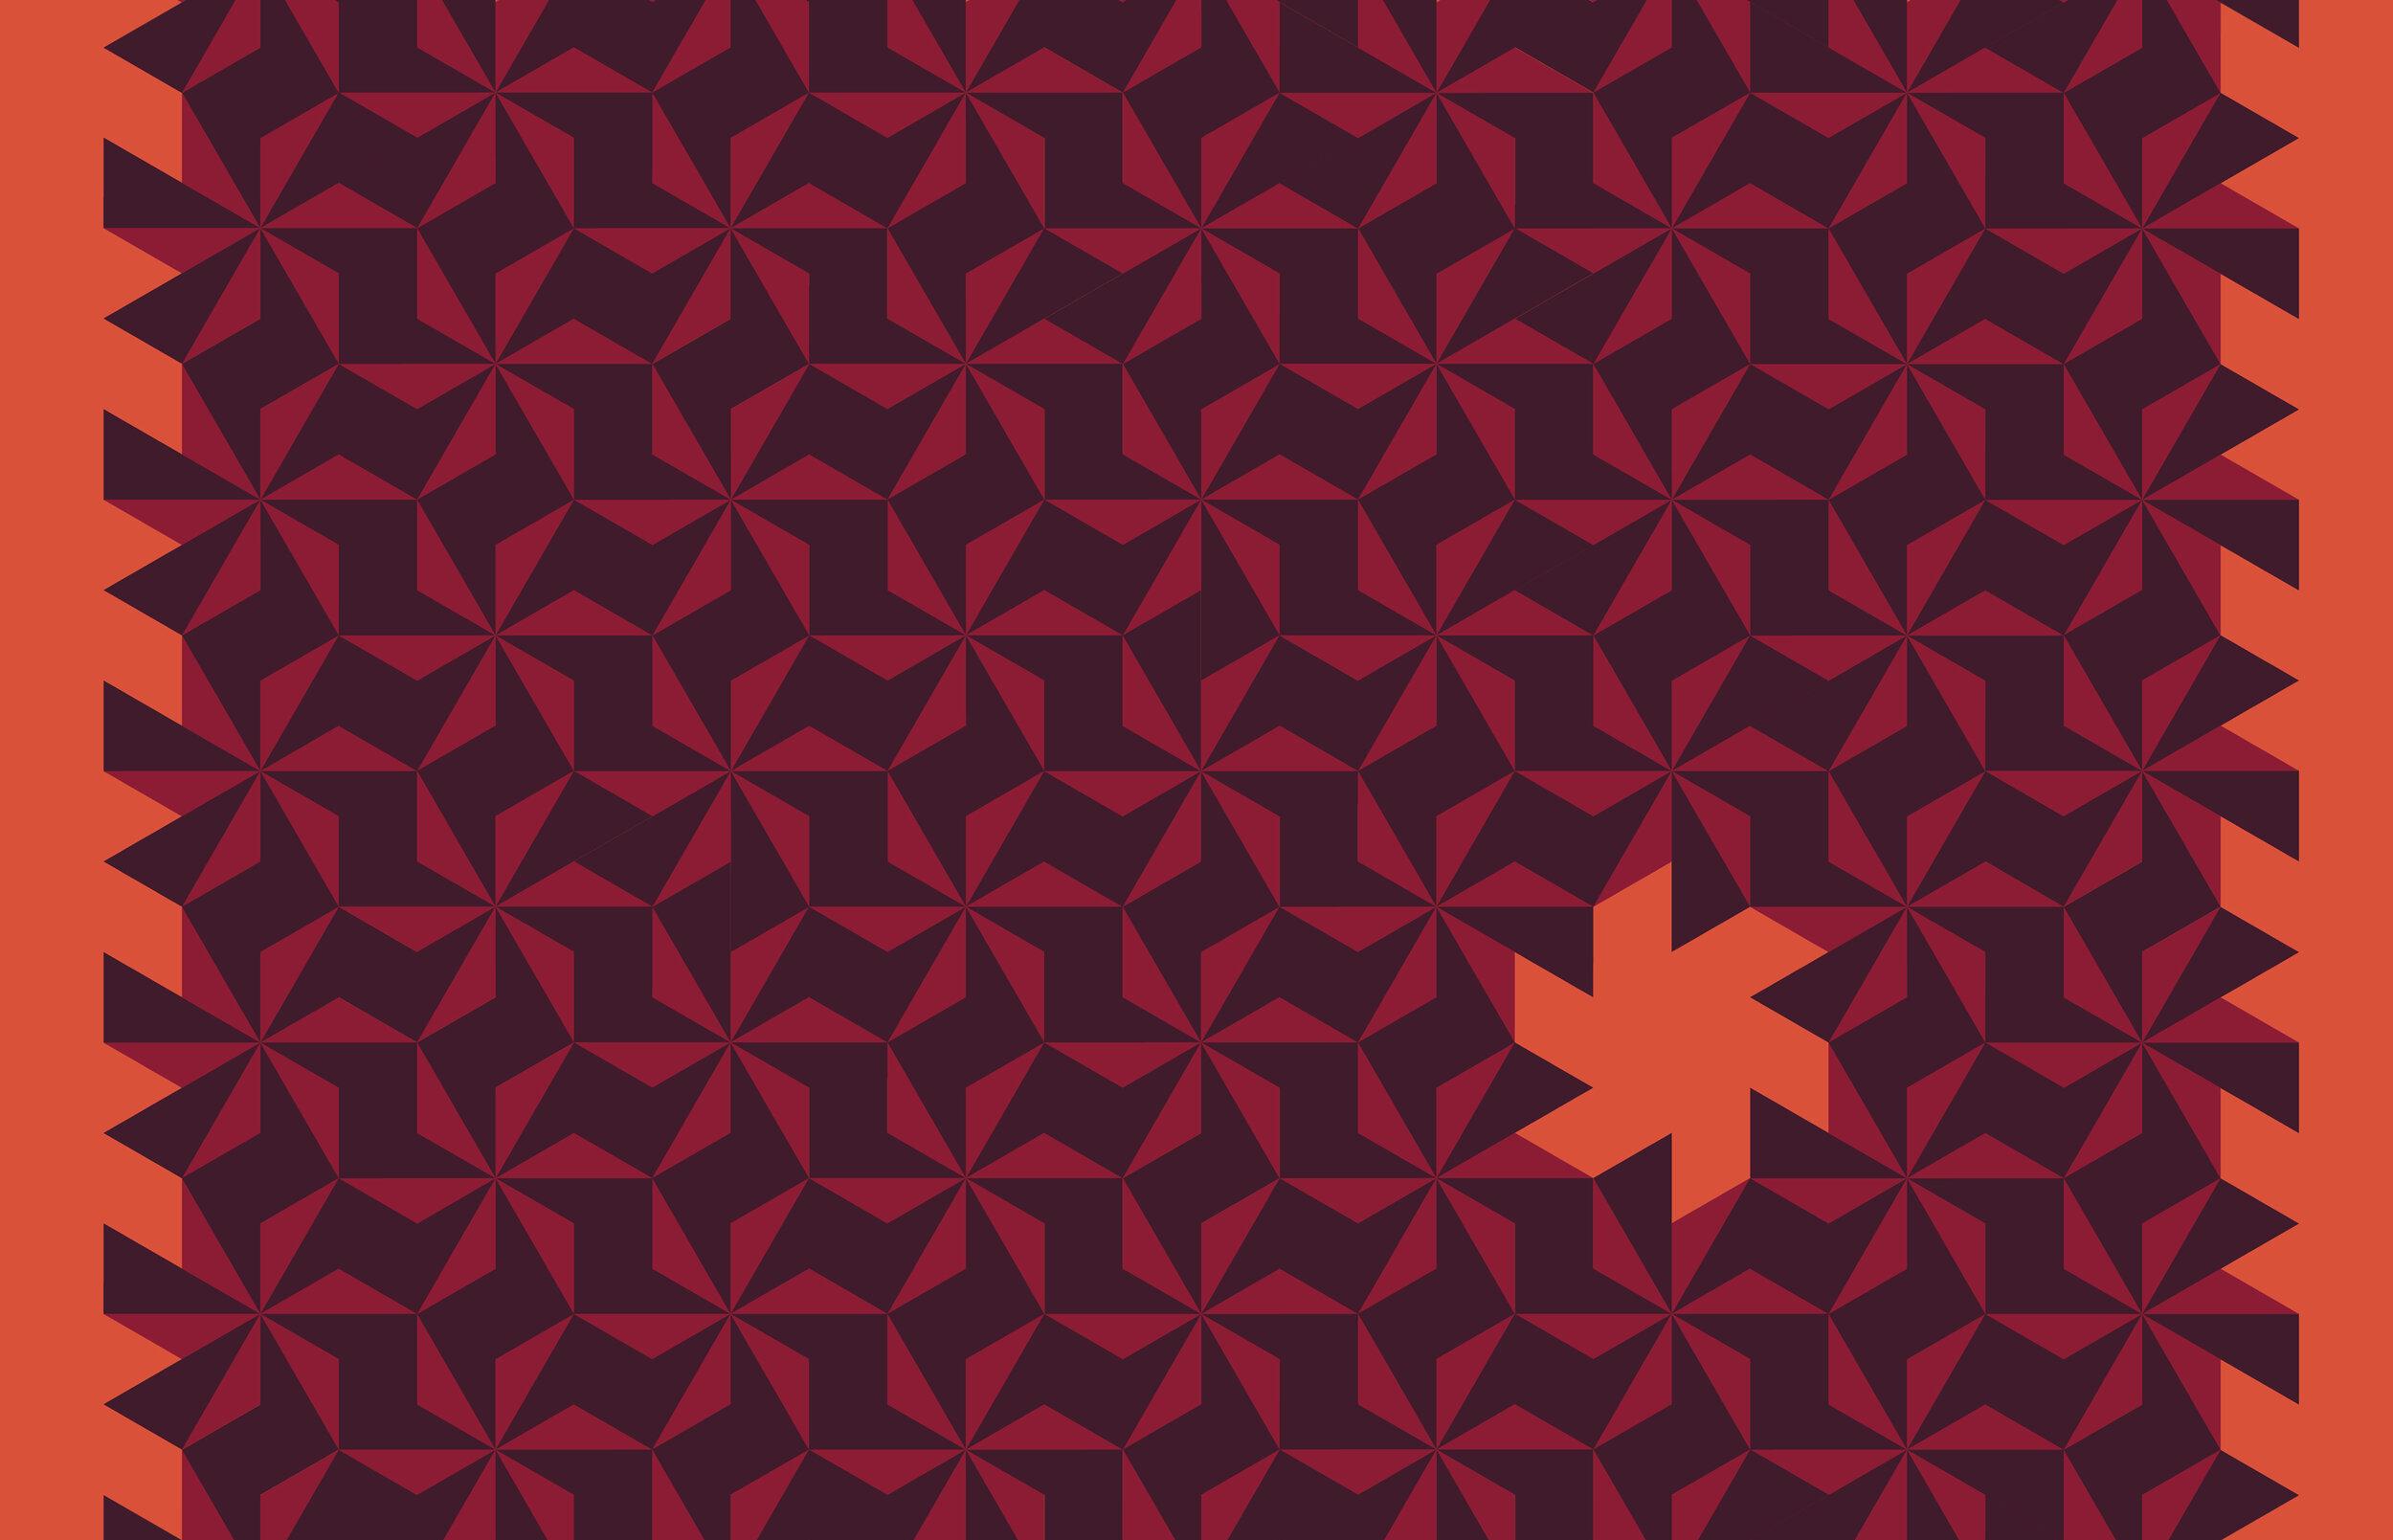 Burgandy Hexagagon Tile.jpg